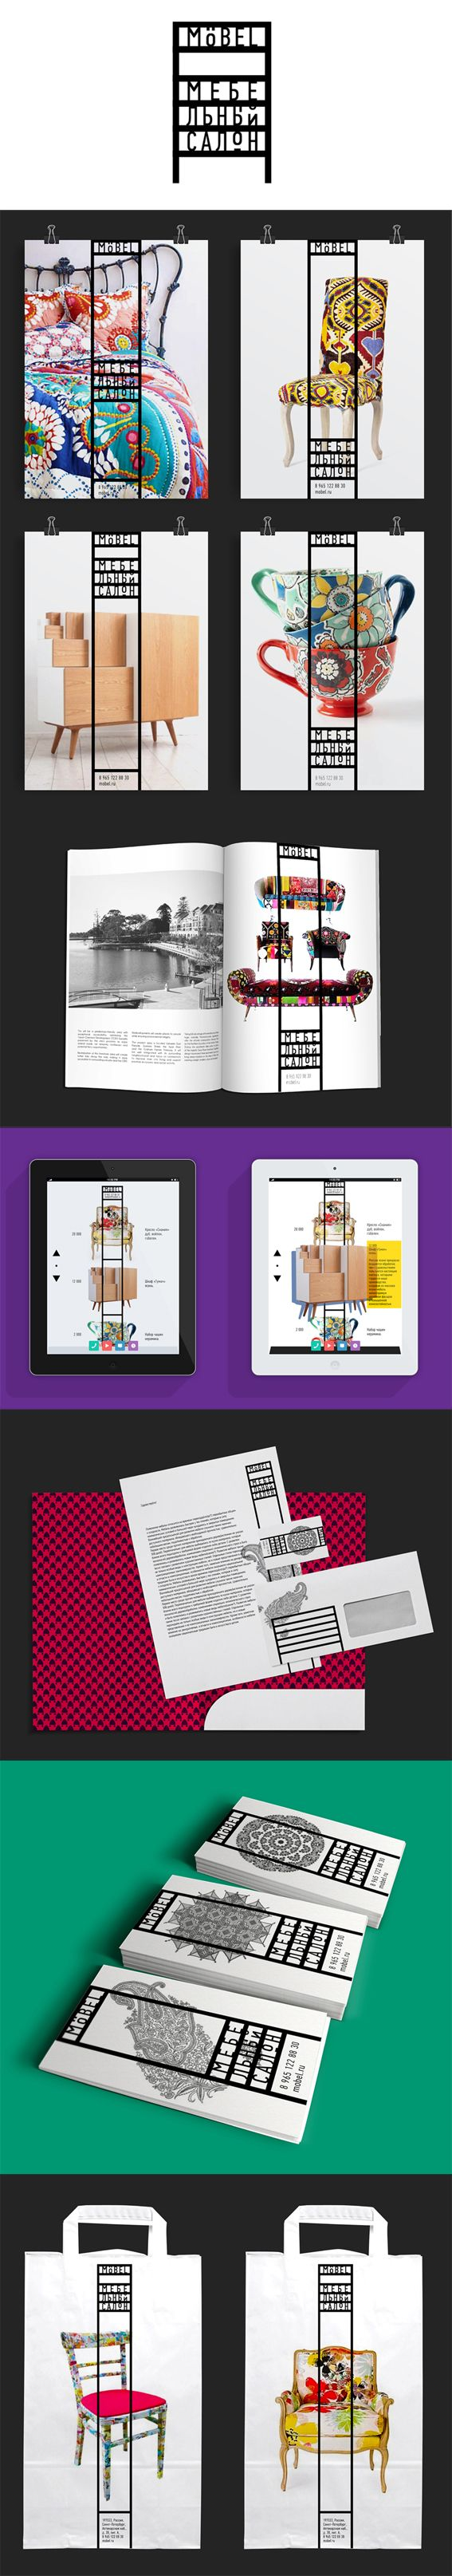 Möbel, Identity © МаратХарисов #identity #packaging PD